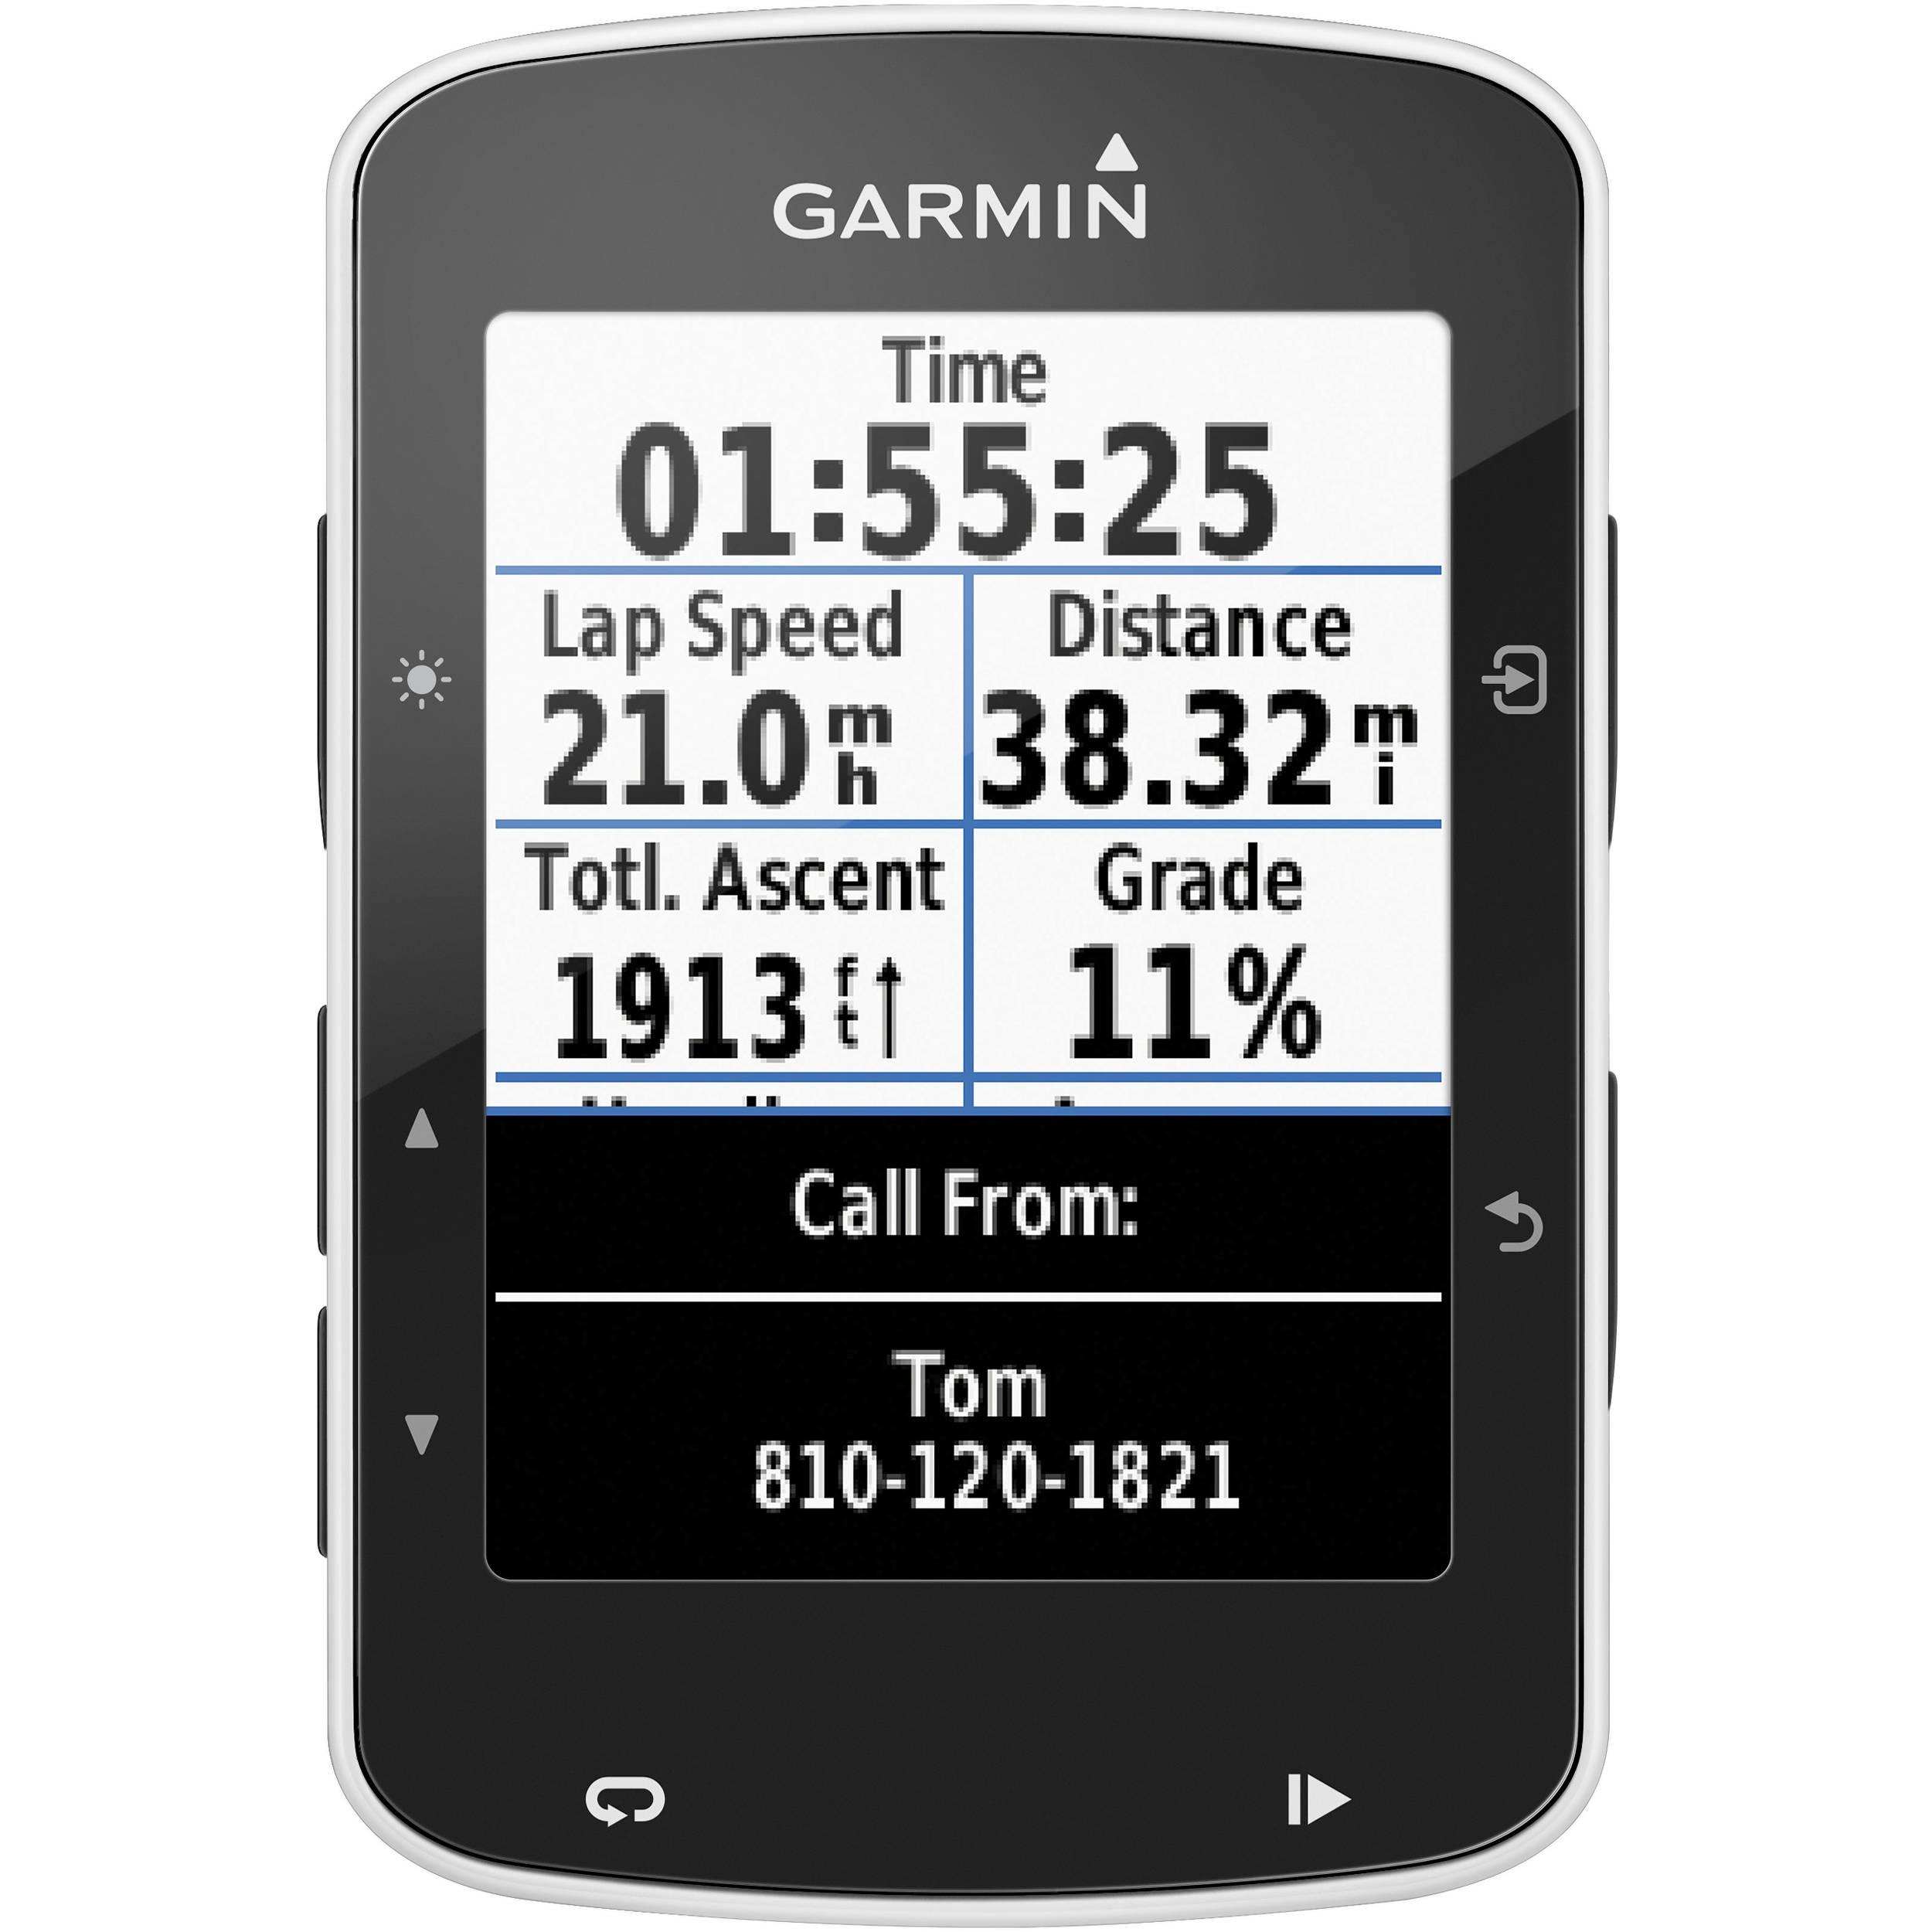 Garmin Cycle Computer >> Garmin Edge 520 Gps Glonass Cycling Computer